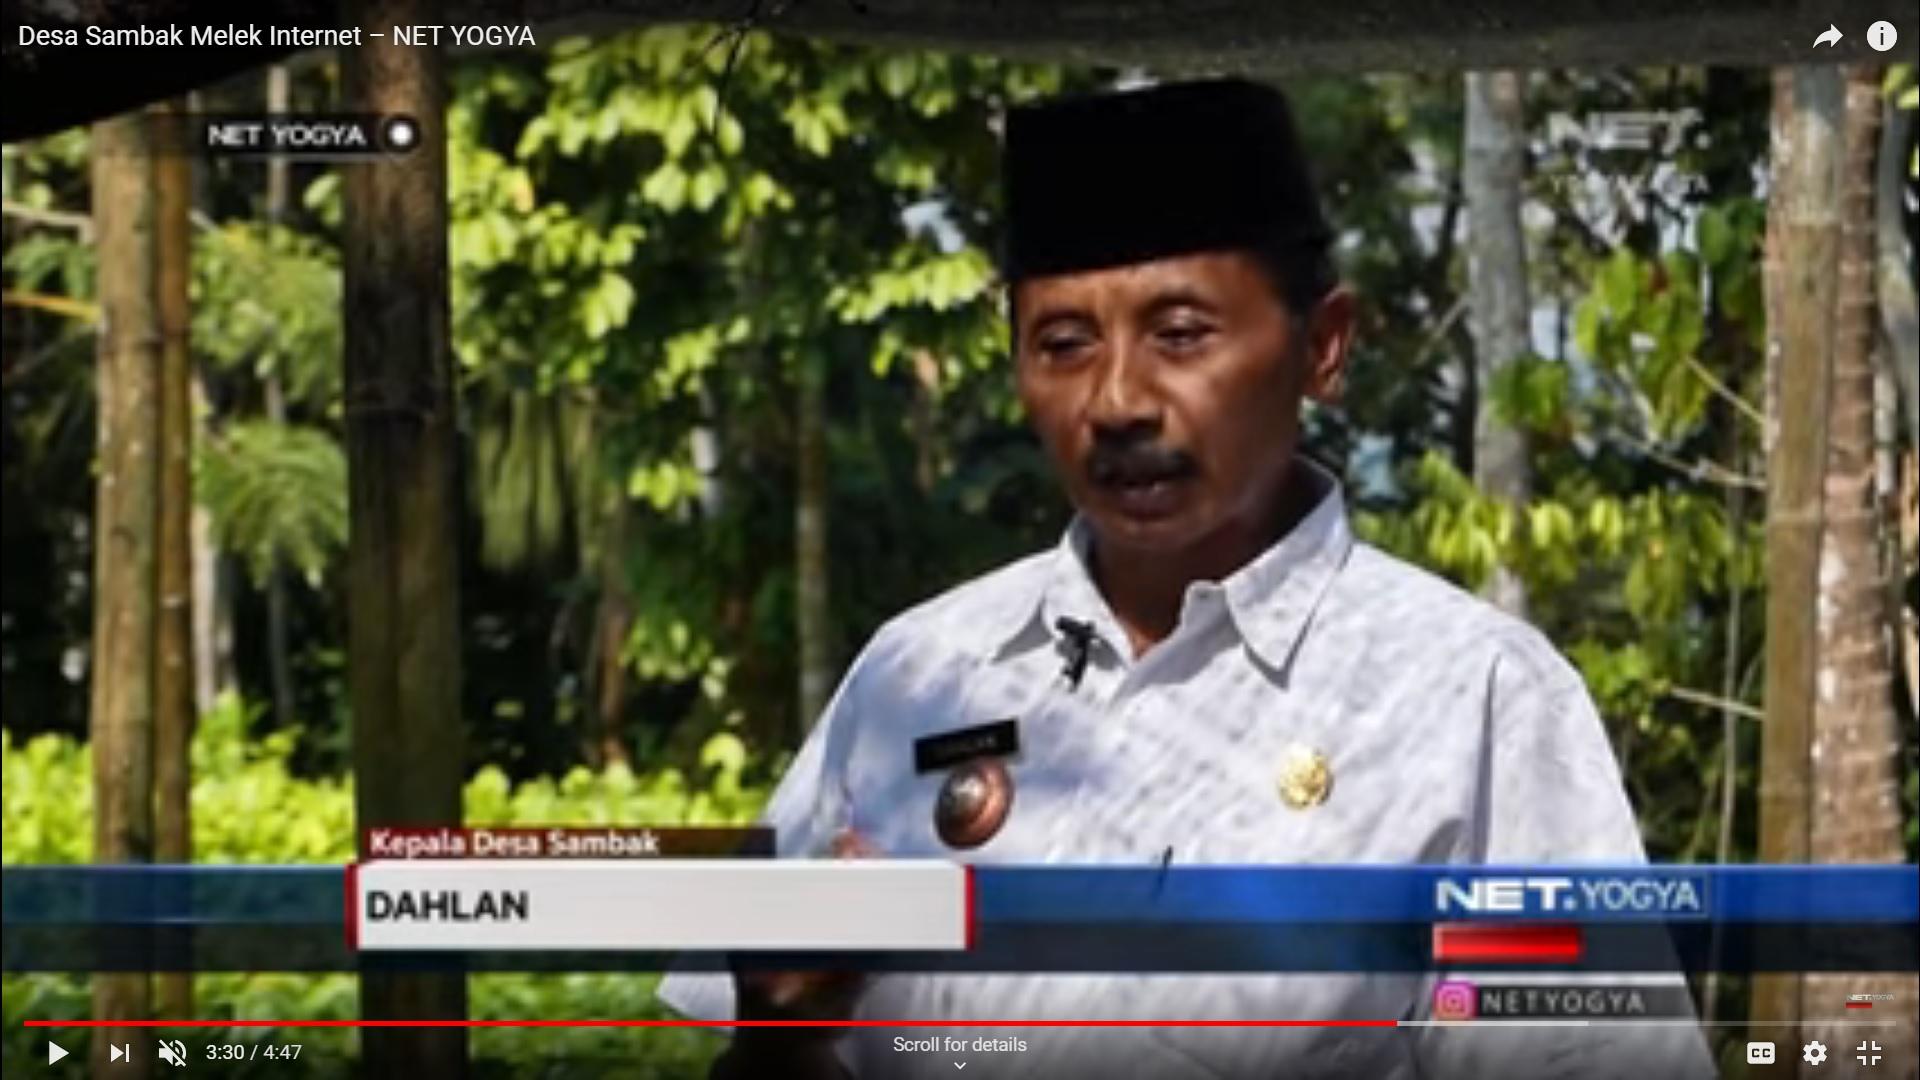 Desa Sambak Melek Internet – NET YOGYA